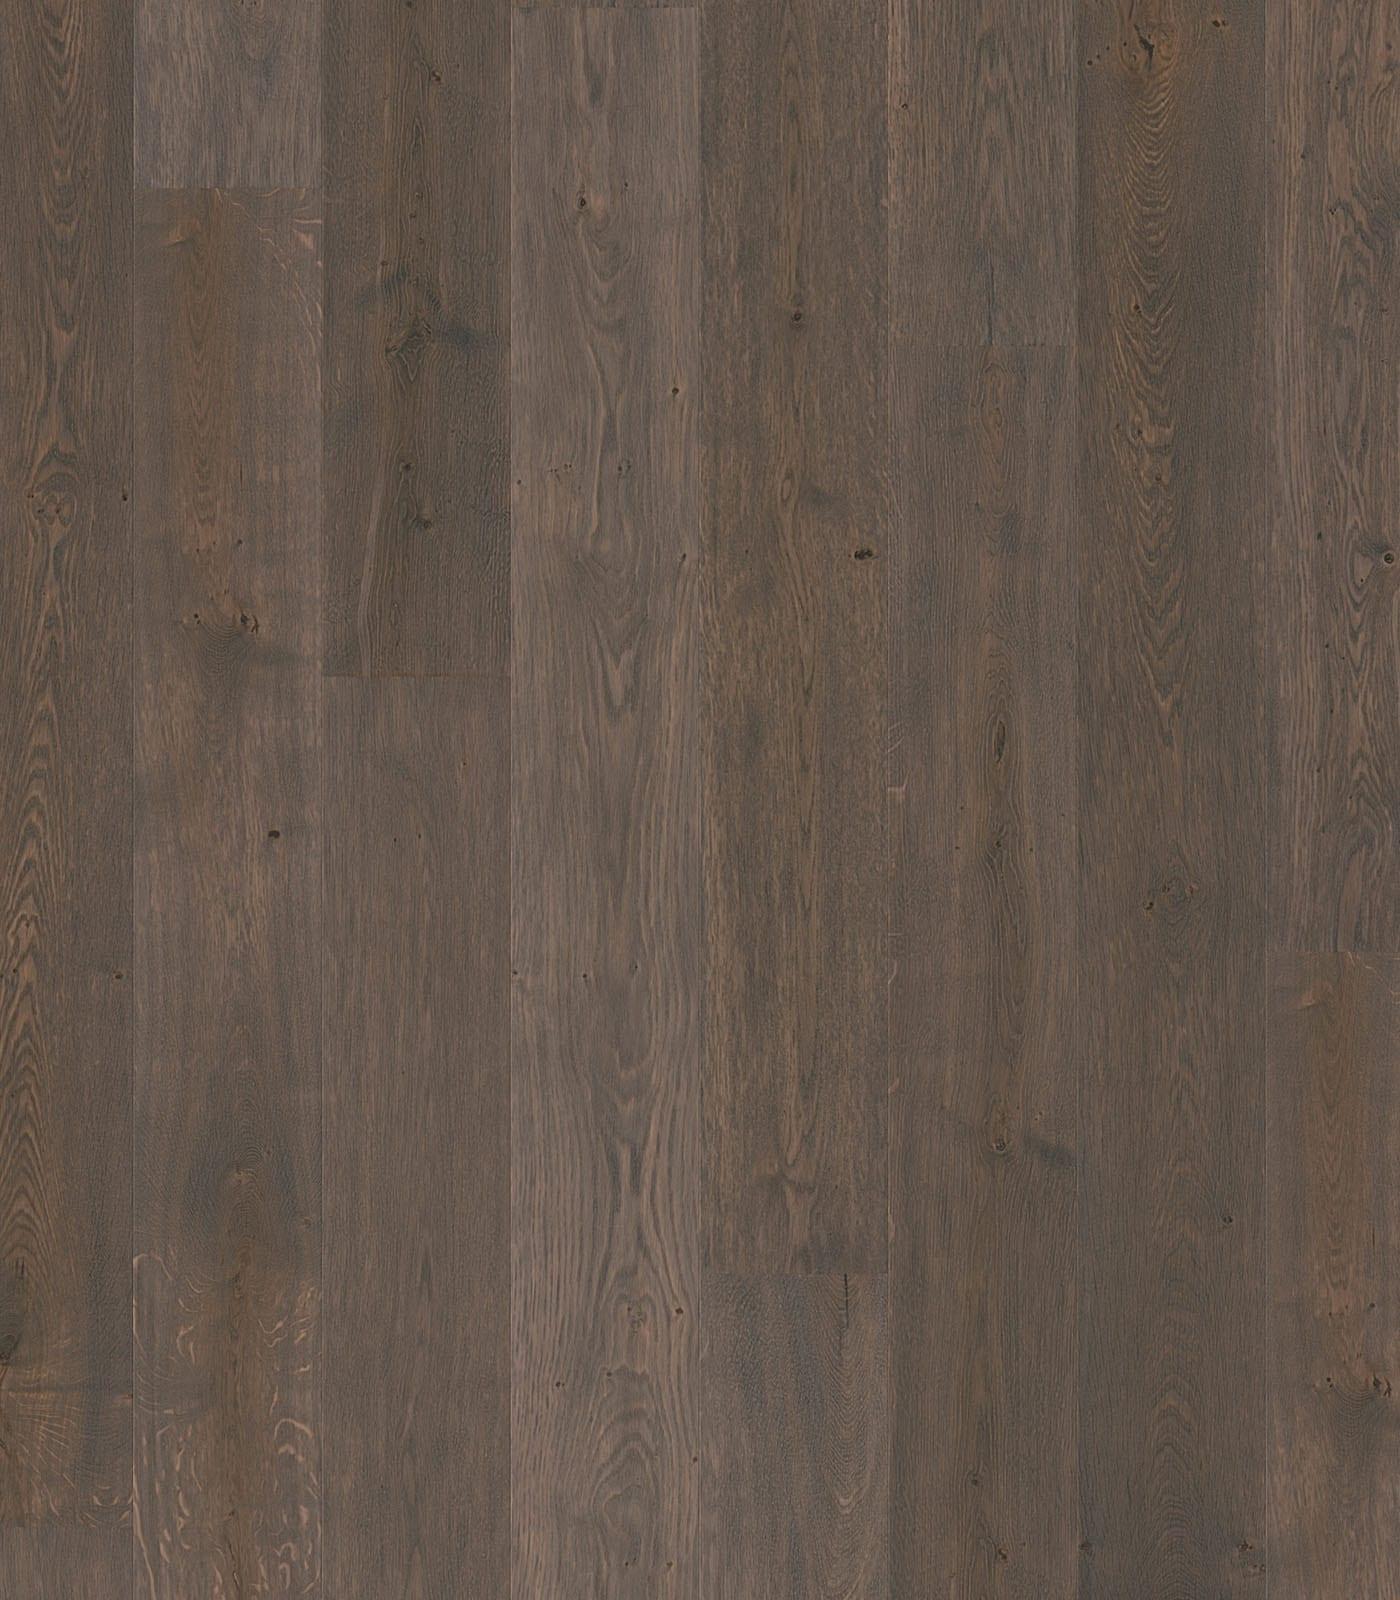 Driftwood-engineered floors-European Oak-flat